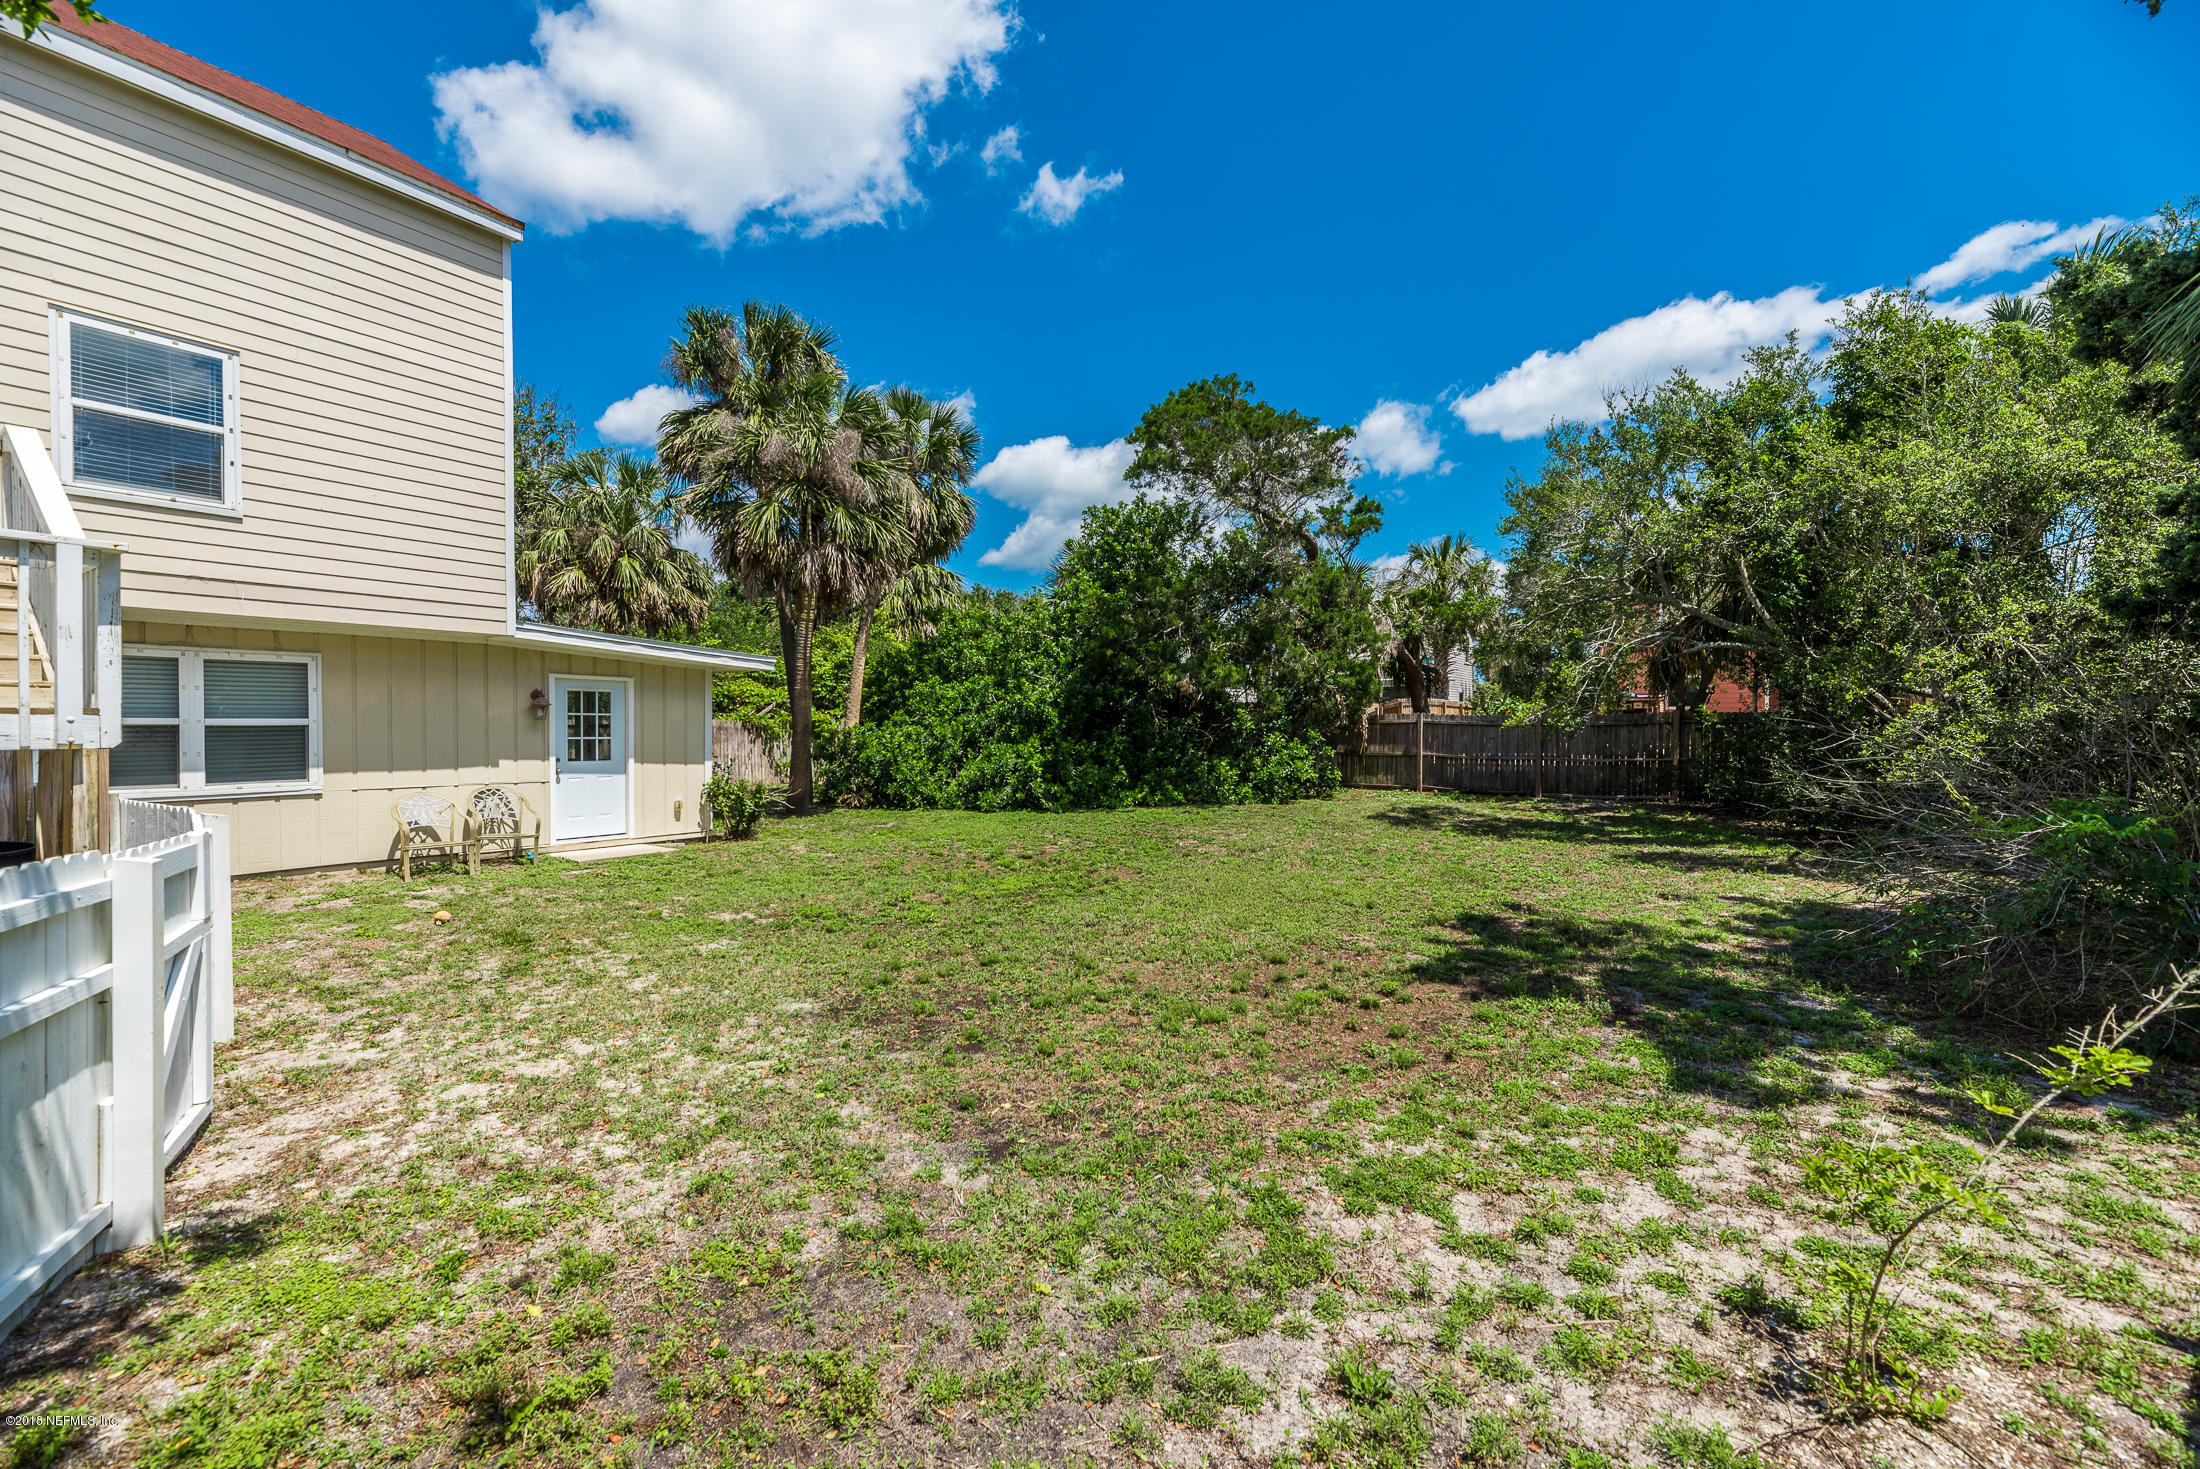 48 MANRESA, ST AUGUSTINE, FLORIDA 32084, 4 Bedrooms Bedrooms, ,3 BathroomsBathrooms,Residential - single family,For sale,MANRESA,933407